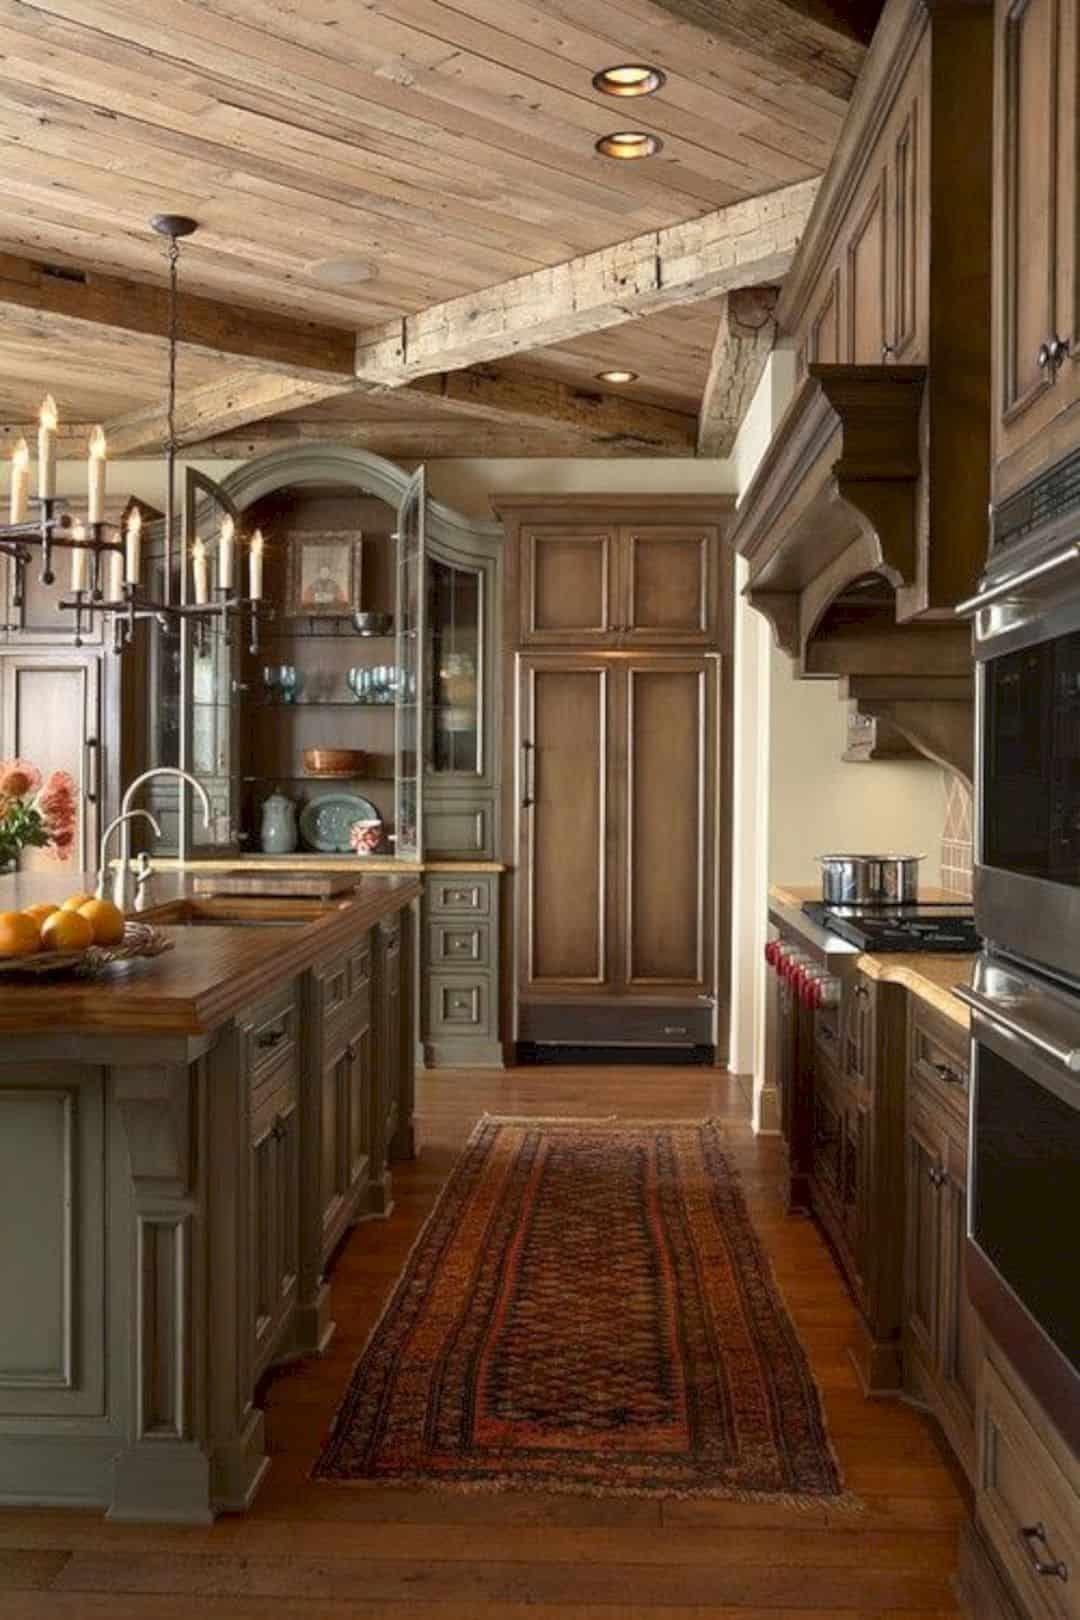 16 Classic Old World Interior Design Ideas Country Kitchen